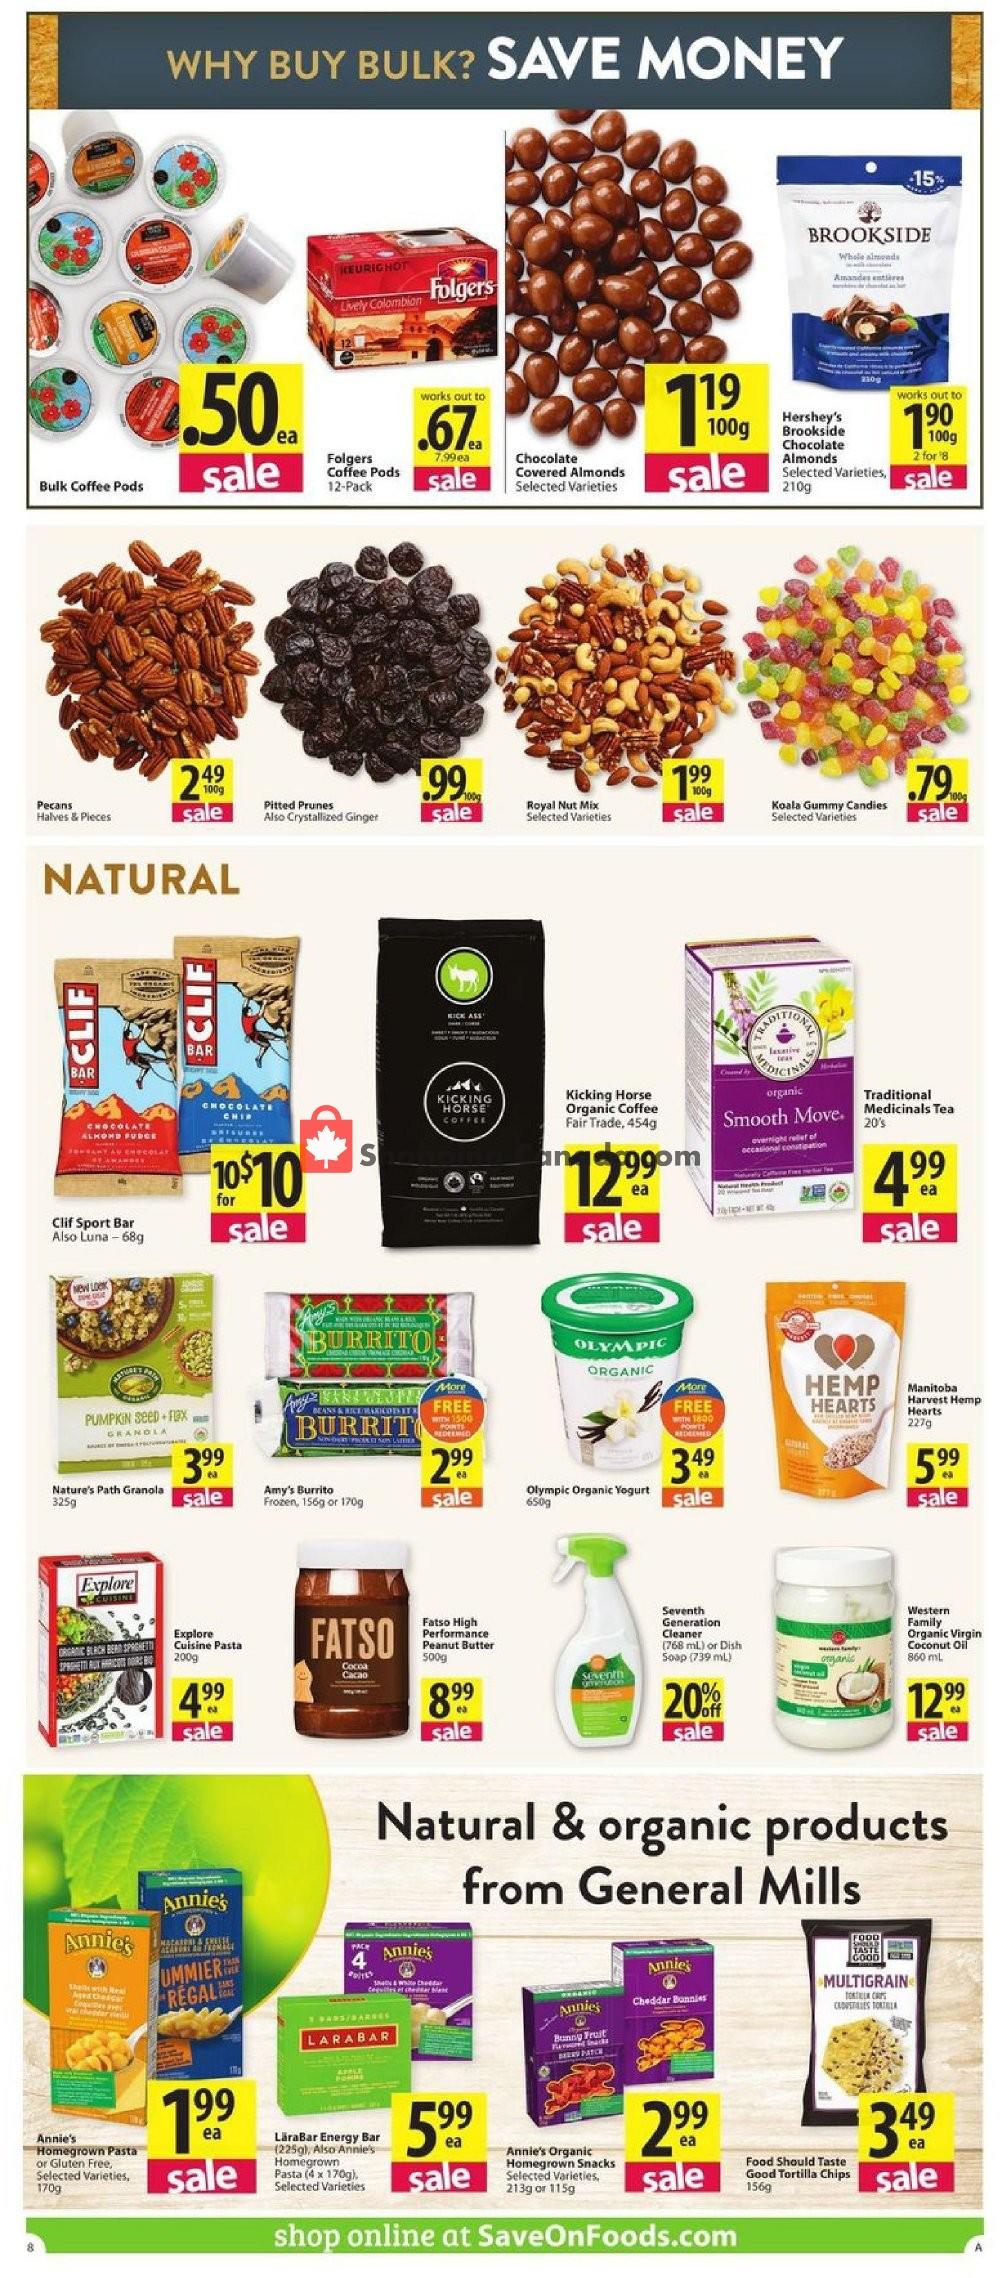 Flyer PriceSmart Foods Canada - from Thursday September 5, 2019 to Wednesday September 11, 2019